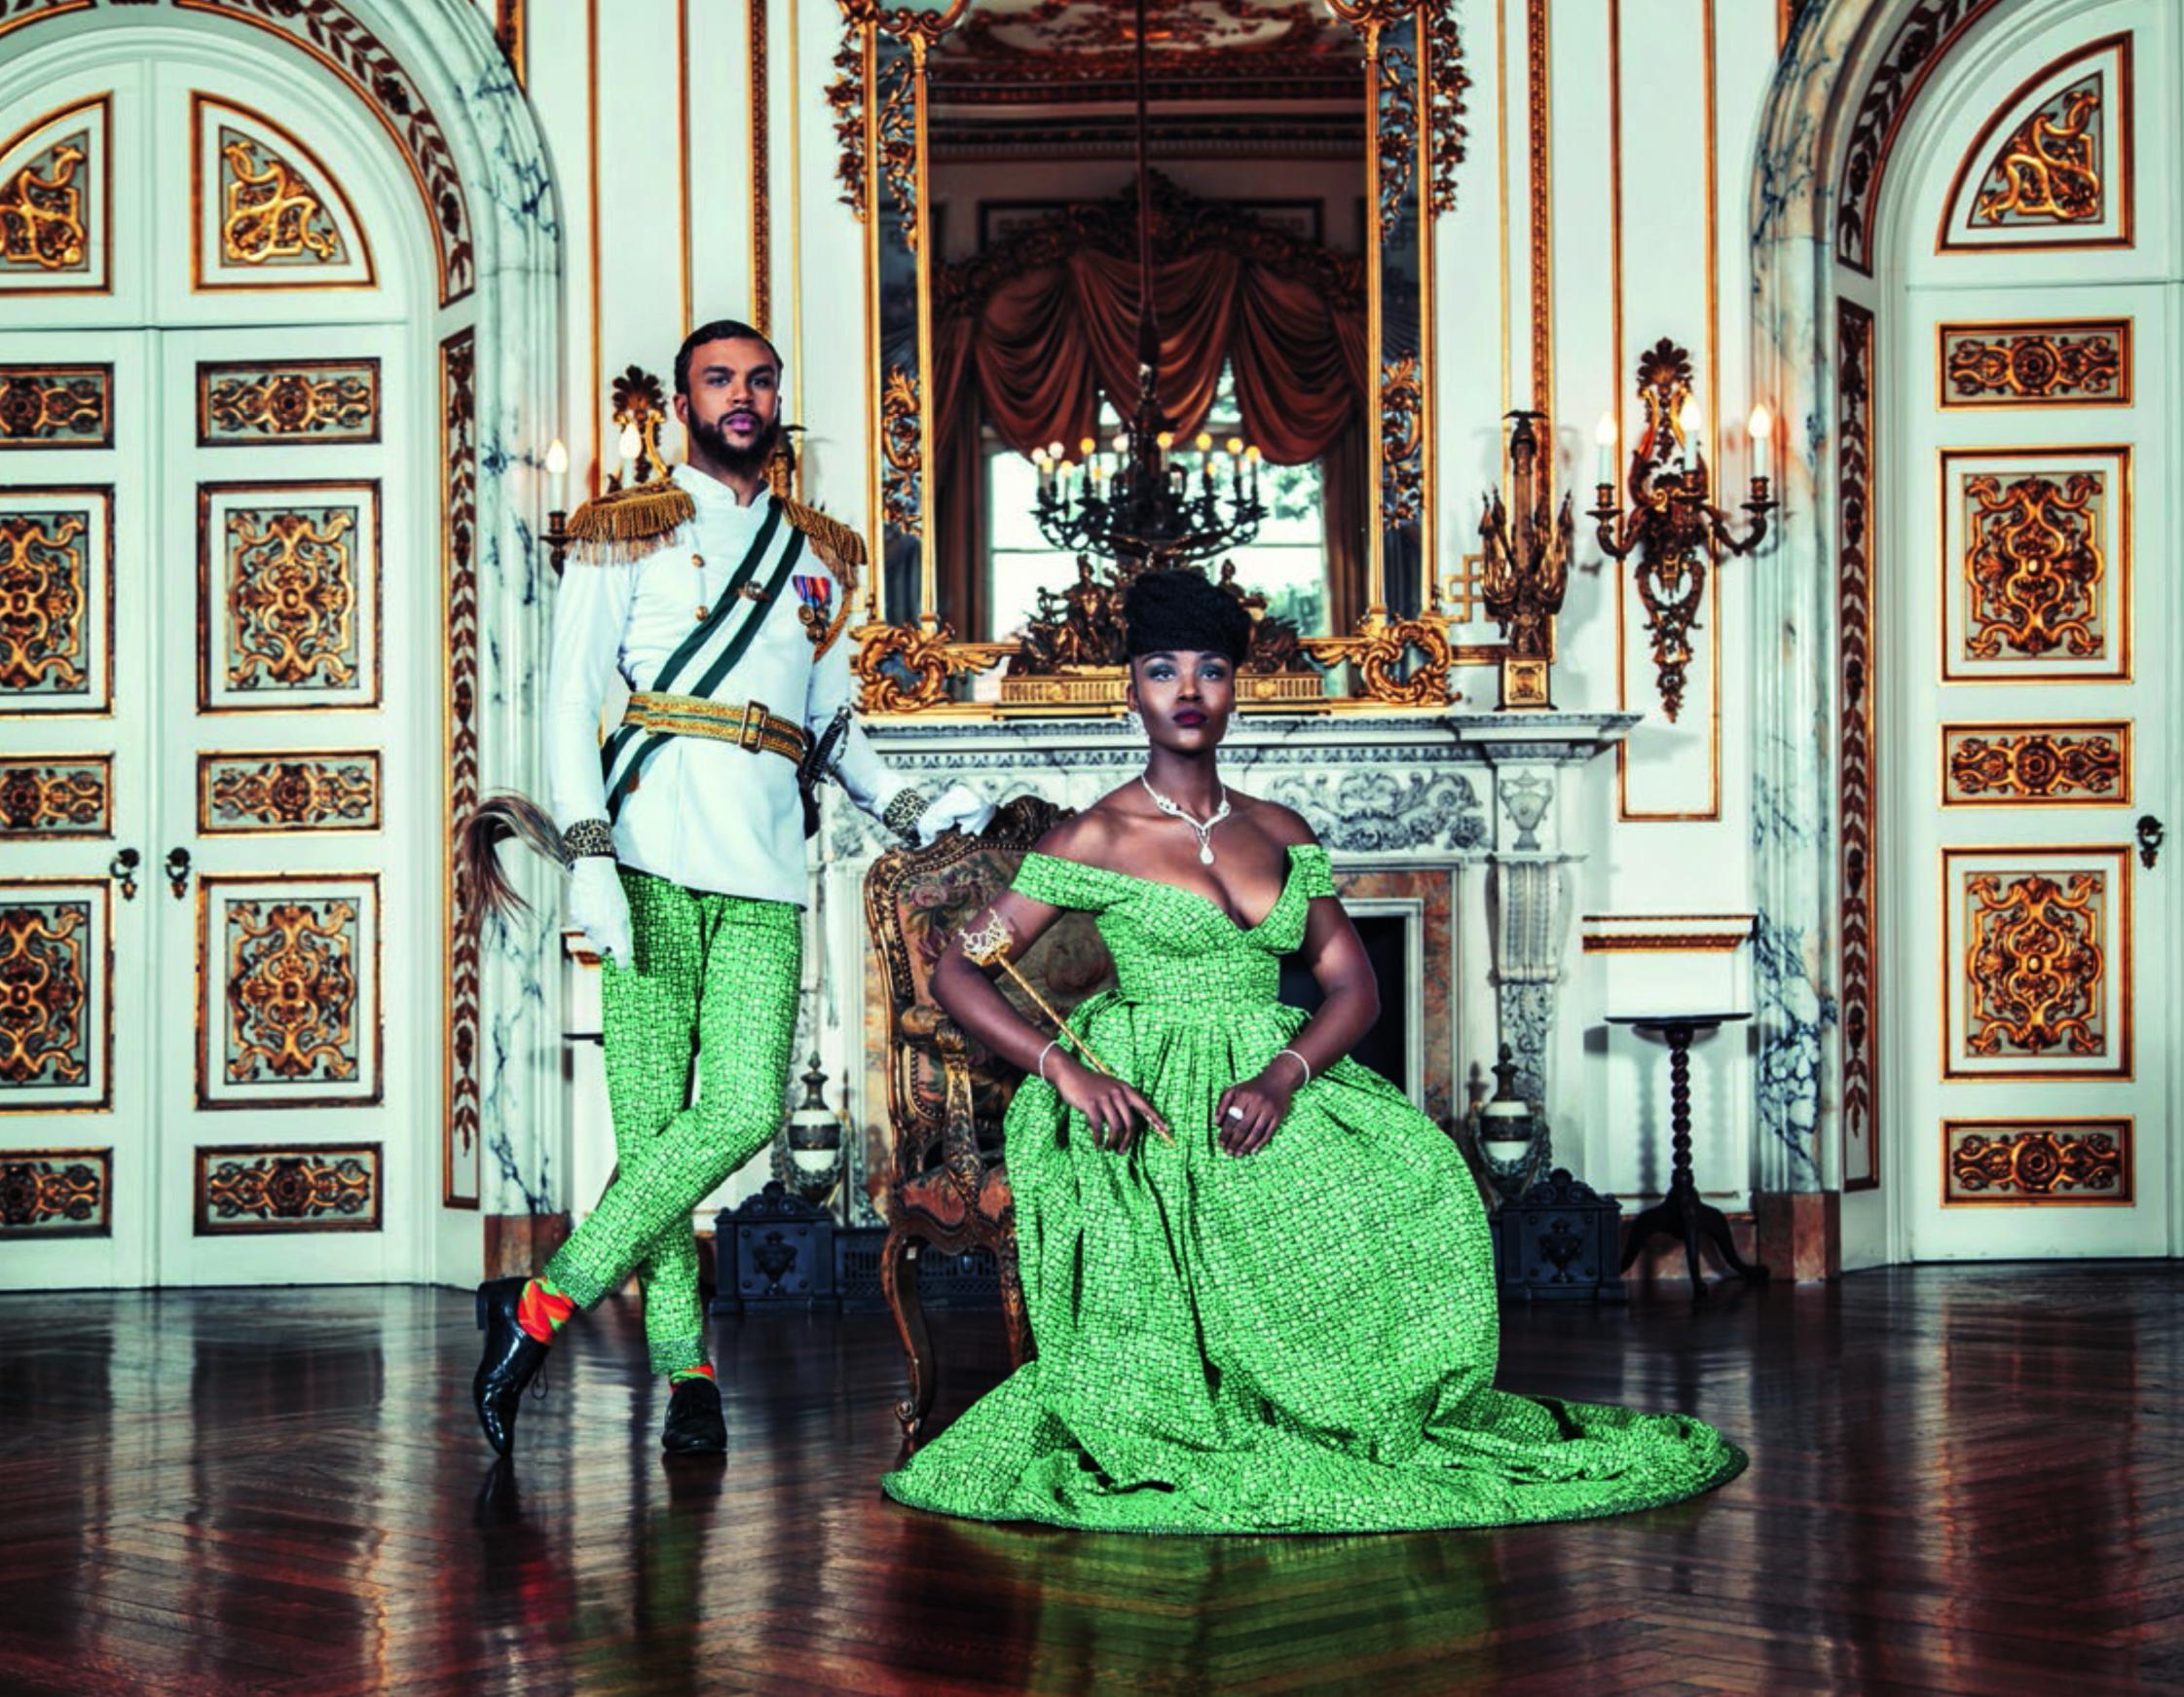 Singer Jidenna photographed by Patrick Amara for a 2015 All Things Ankara Ball Campaign